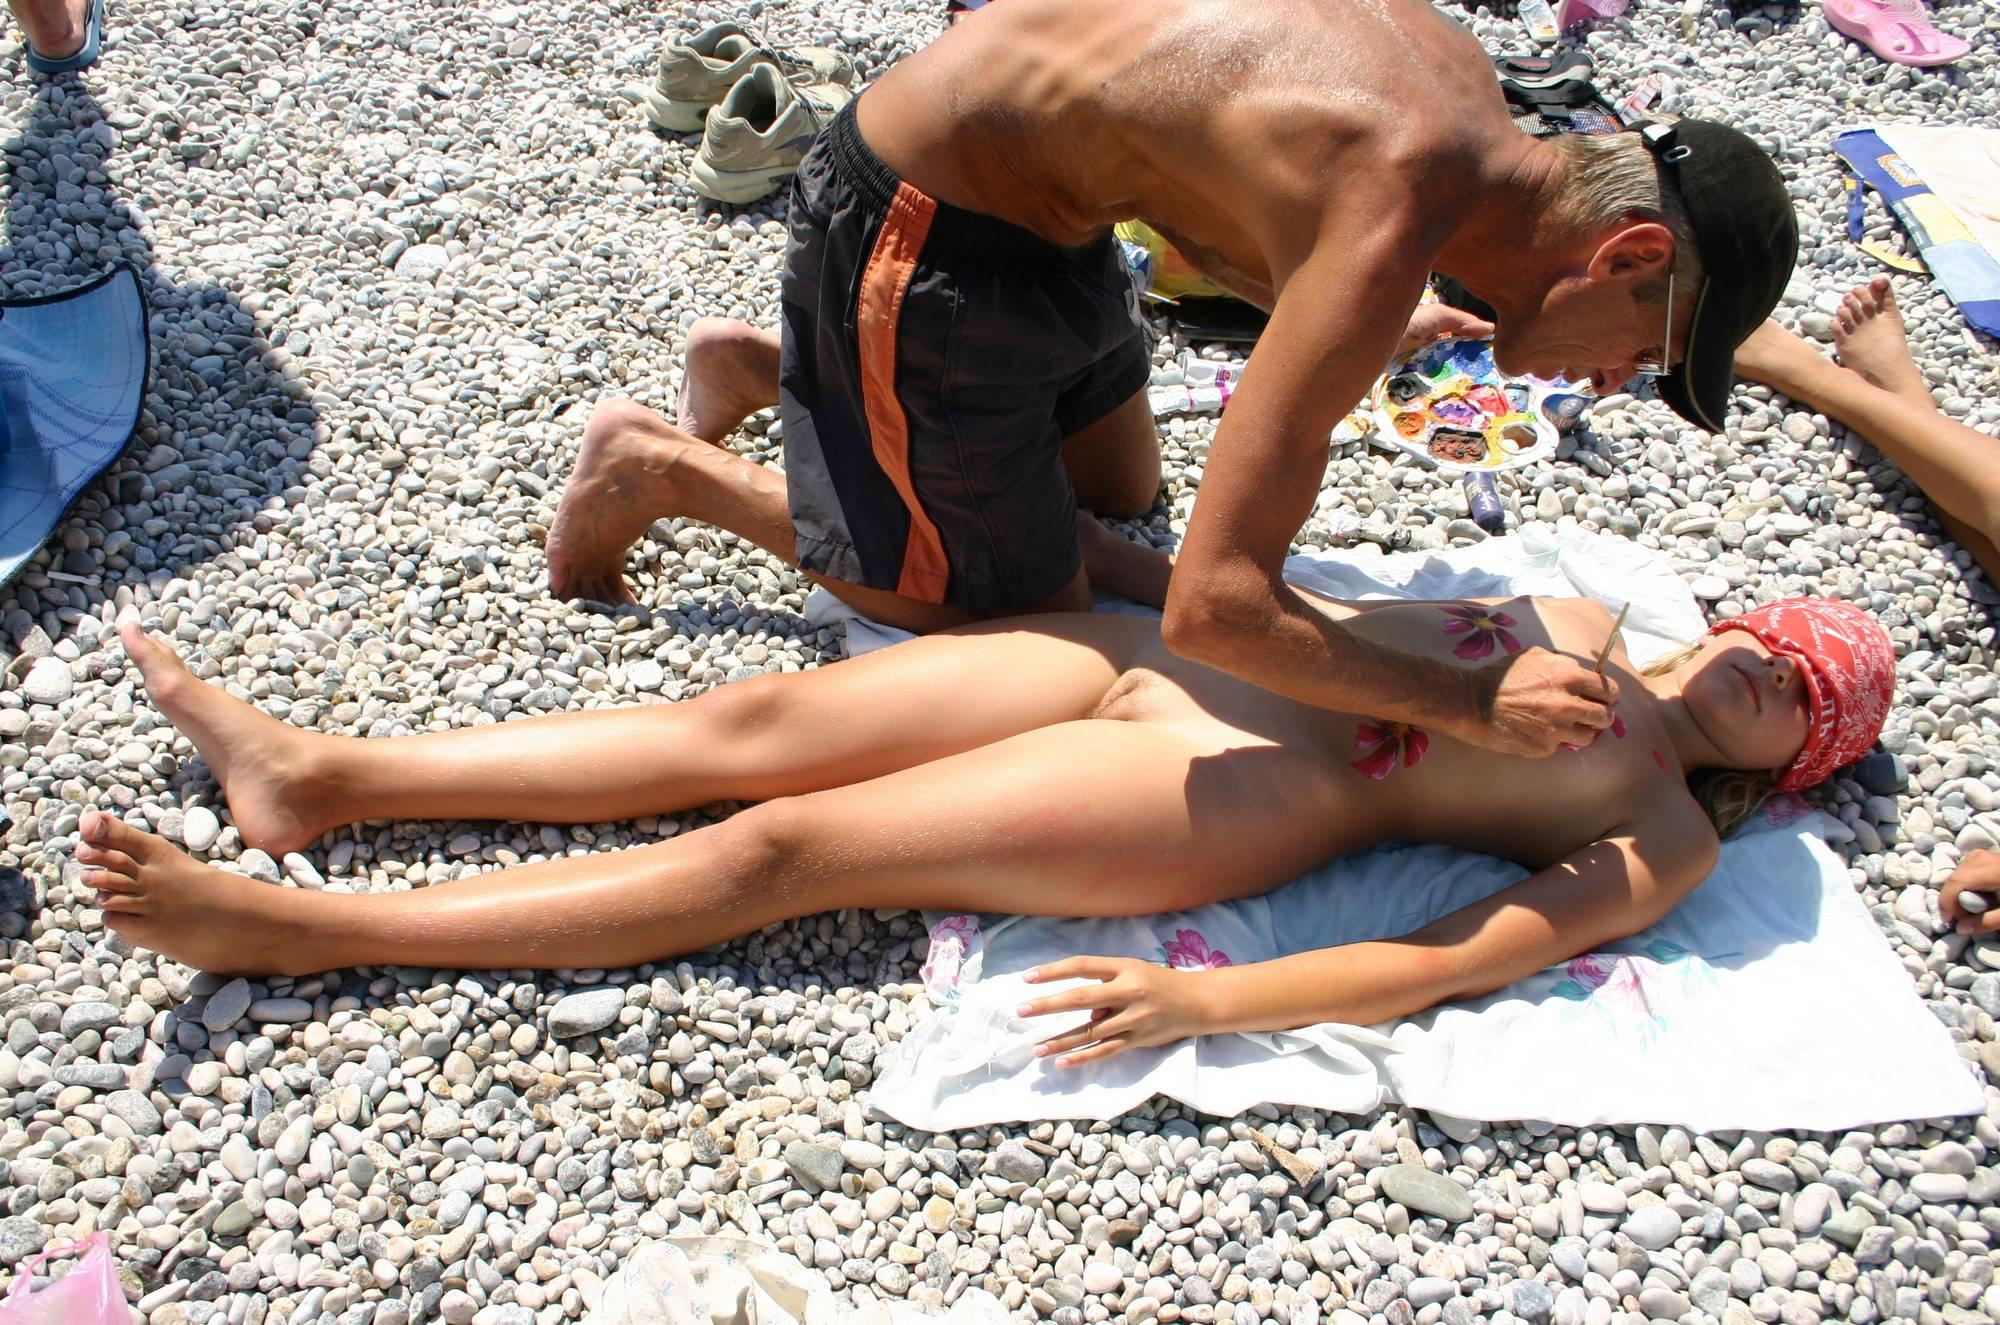 Nudist Gallery Nude Body Painting Prep - 2